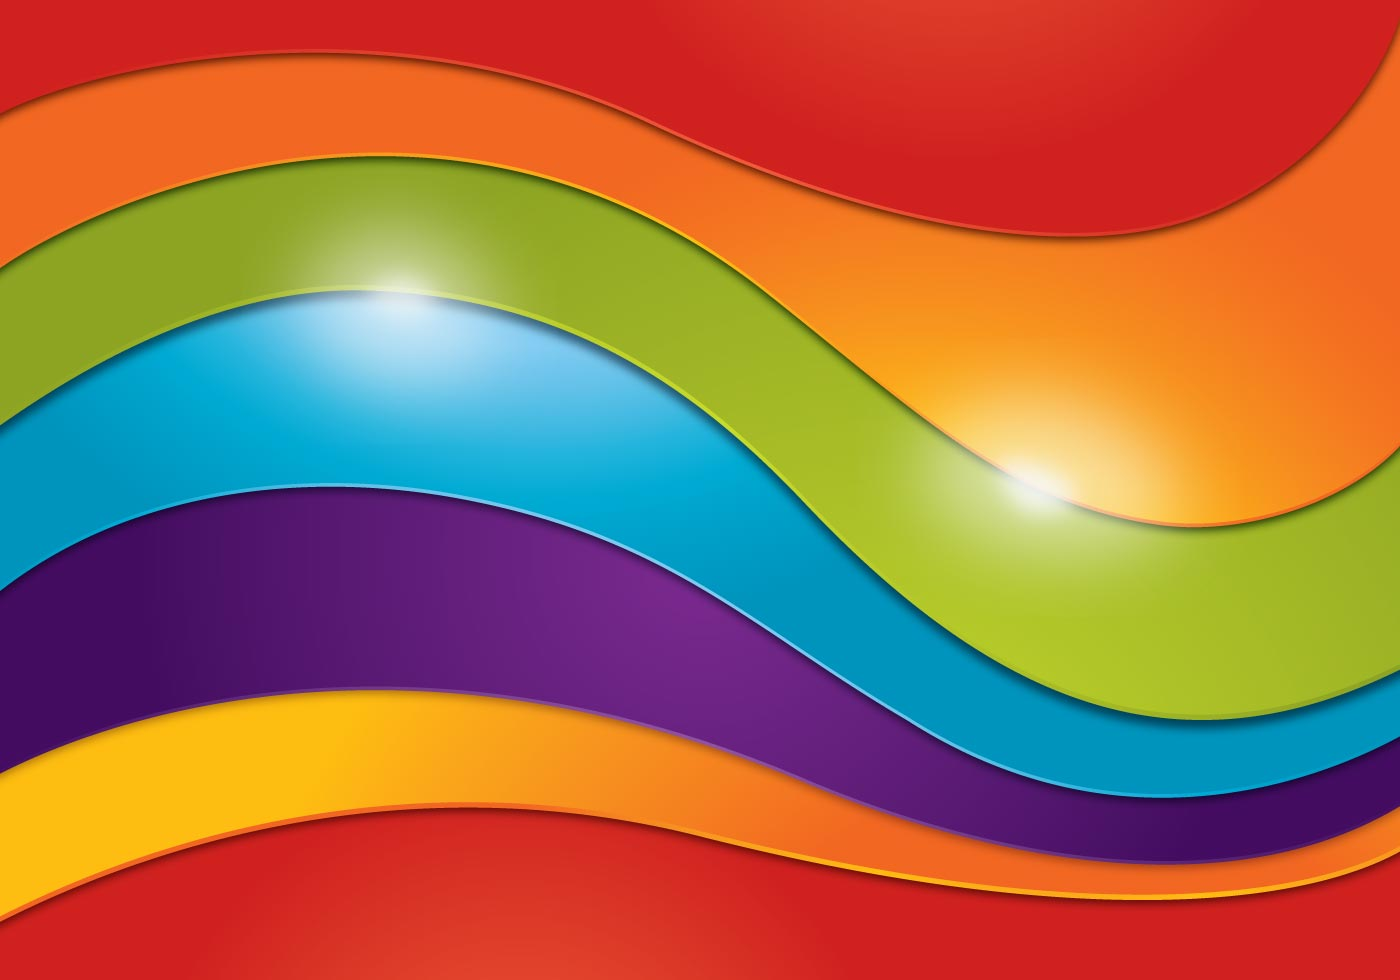 wavy rainbow background download free vector art stock